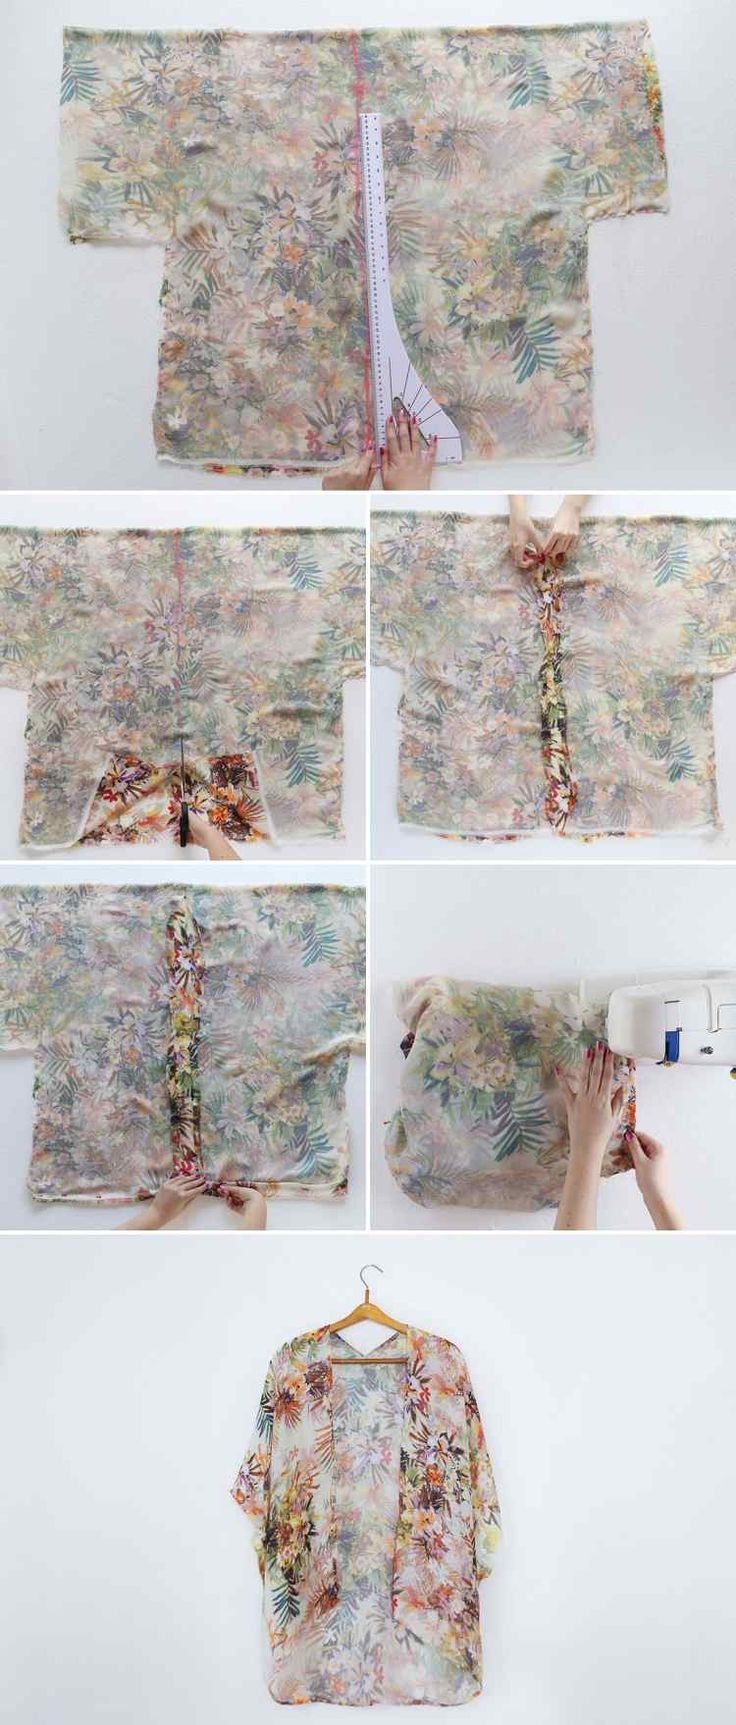 veste kimono femme idée DIY étape par étape